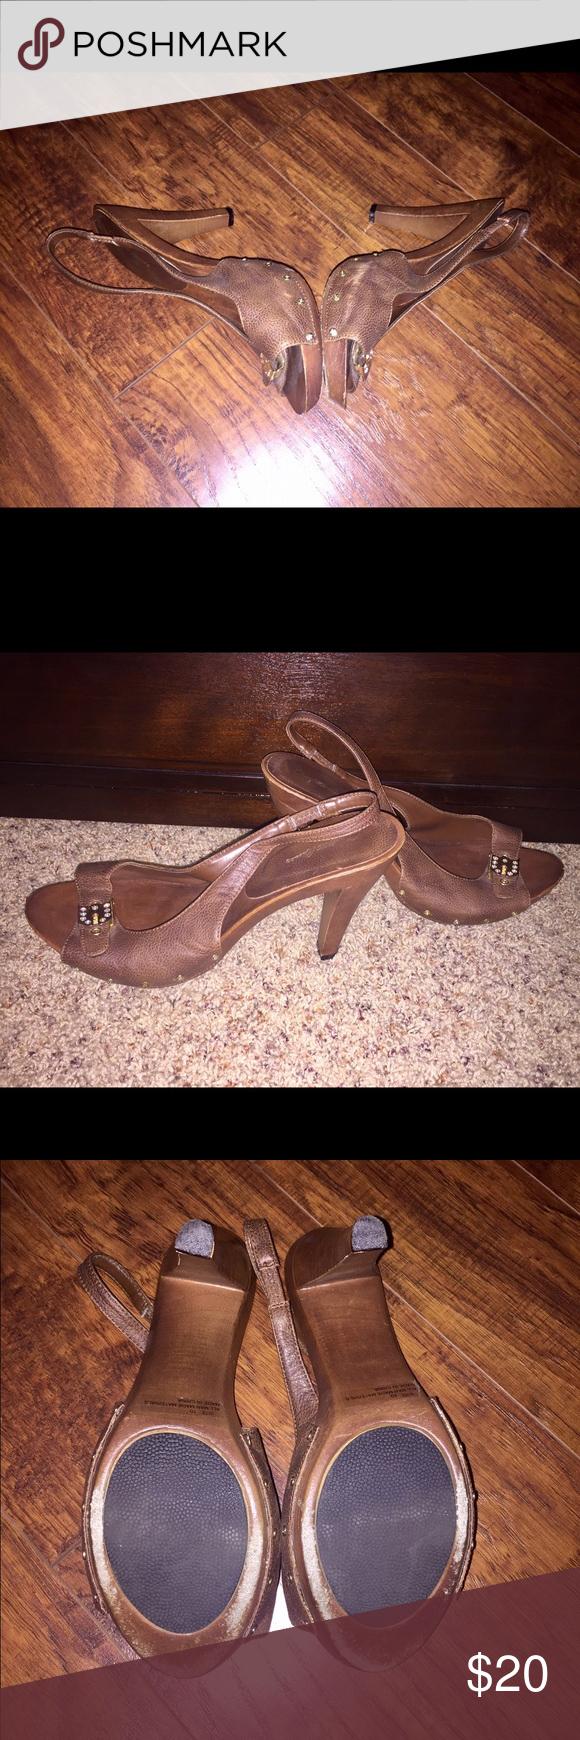 Selling this Charlotte Rouse sling back heels on Poshmark! My username is: kechard. #shopmycloset #poshmark #fashion #shopping #style #forsale #CharlotteRusse #Shoes